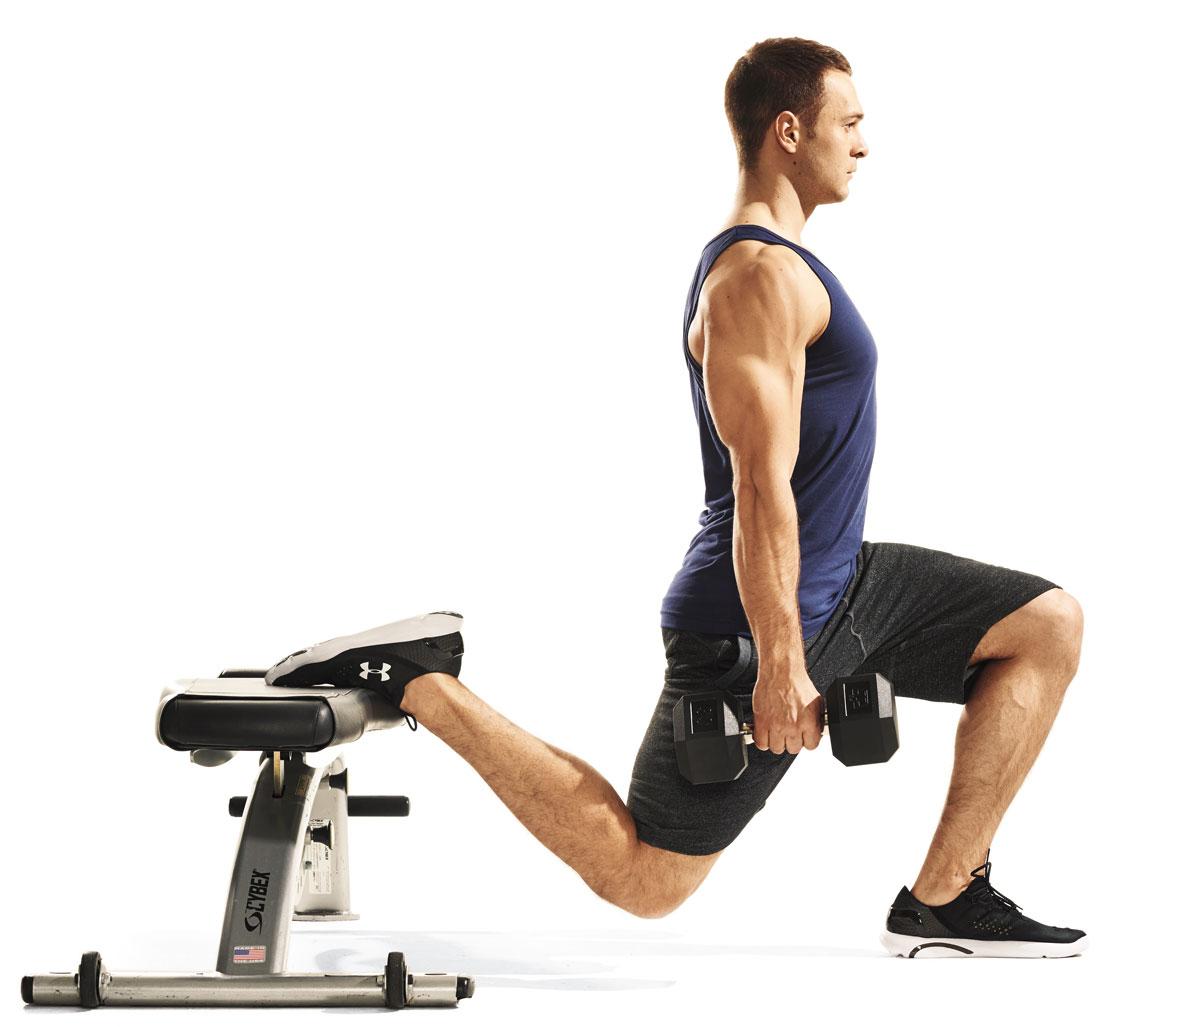 main-the-no-squat-solution-.jpg